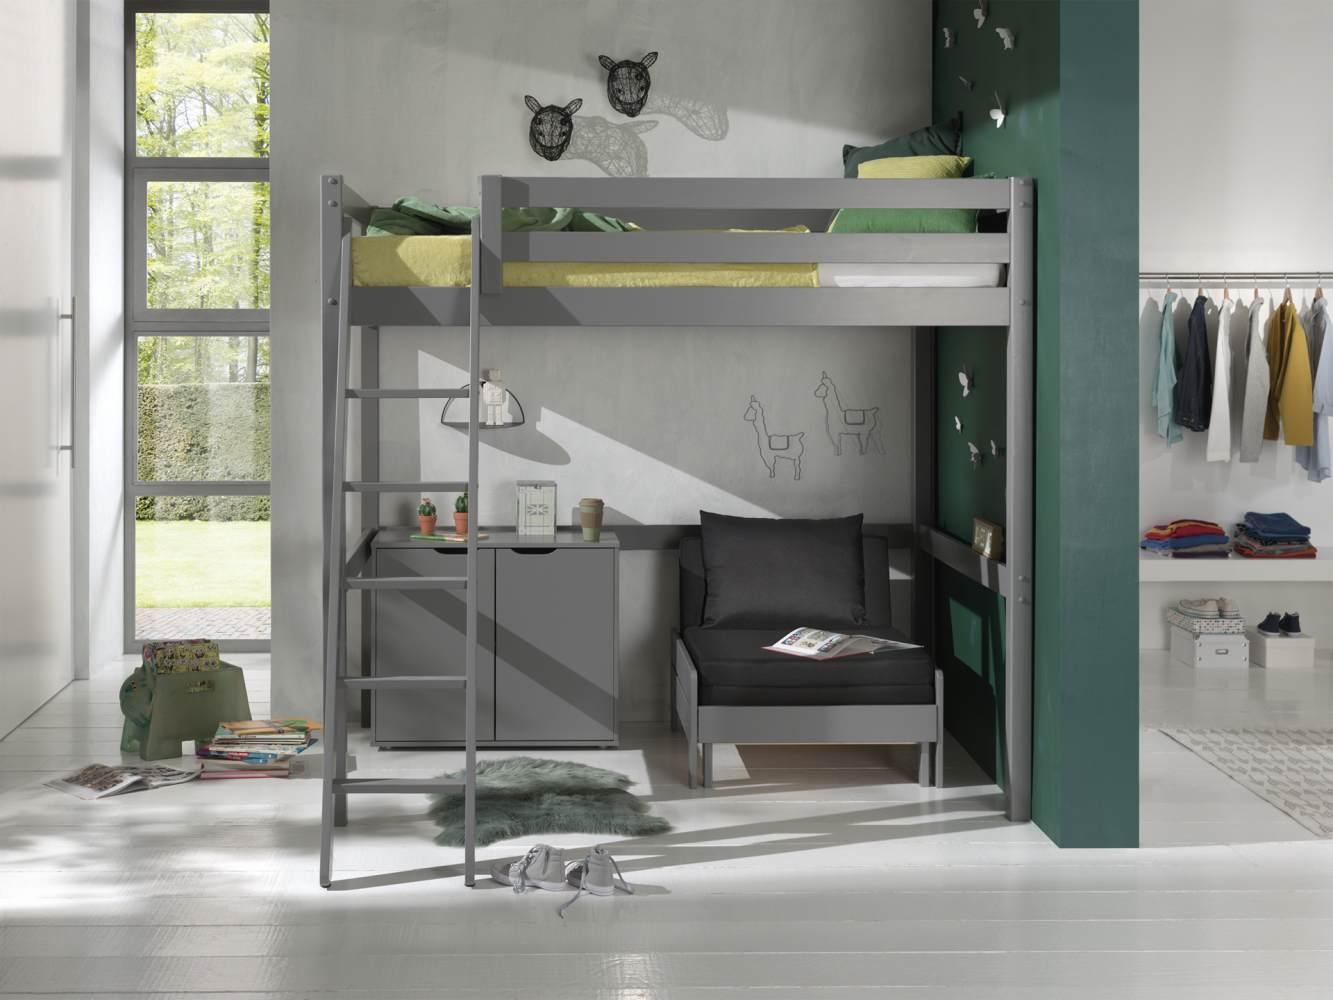 Vipack Hochbett grau, 140 x 200 cm inkl. Sesselbett und Kommode mit 2 Türen Bild 1